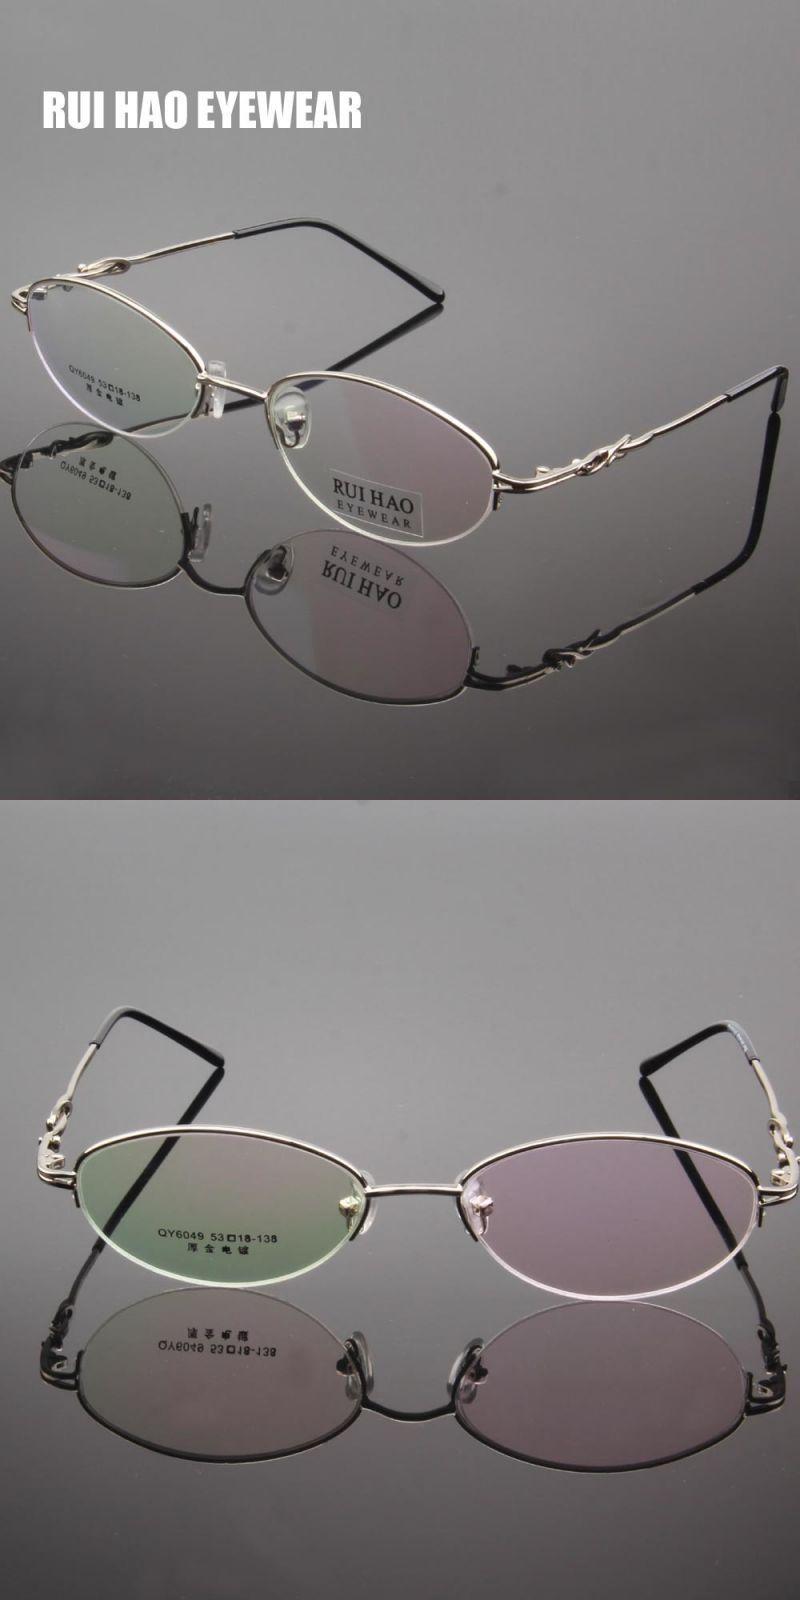 8068e1e2b884 Rui hao eyewea oval eyeglasses frame women half rimless brand glasses frame  optical spectacles frames prescription